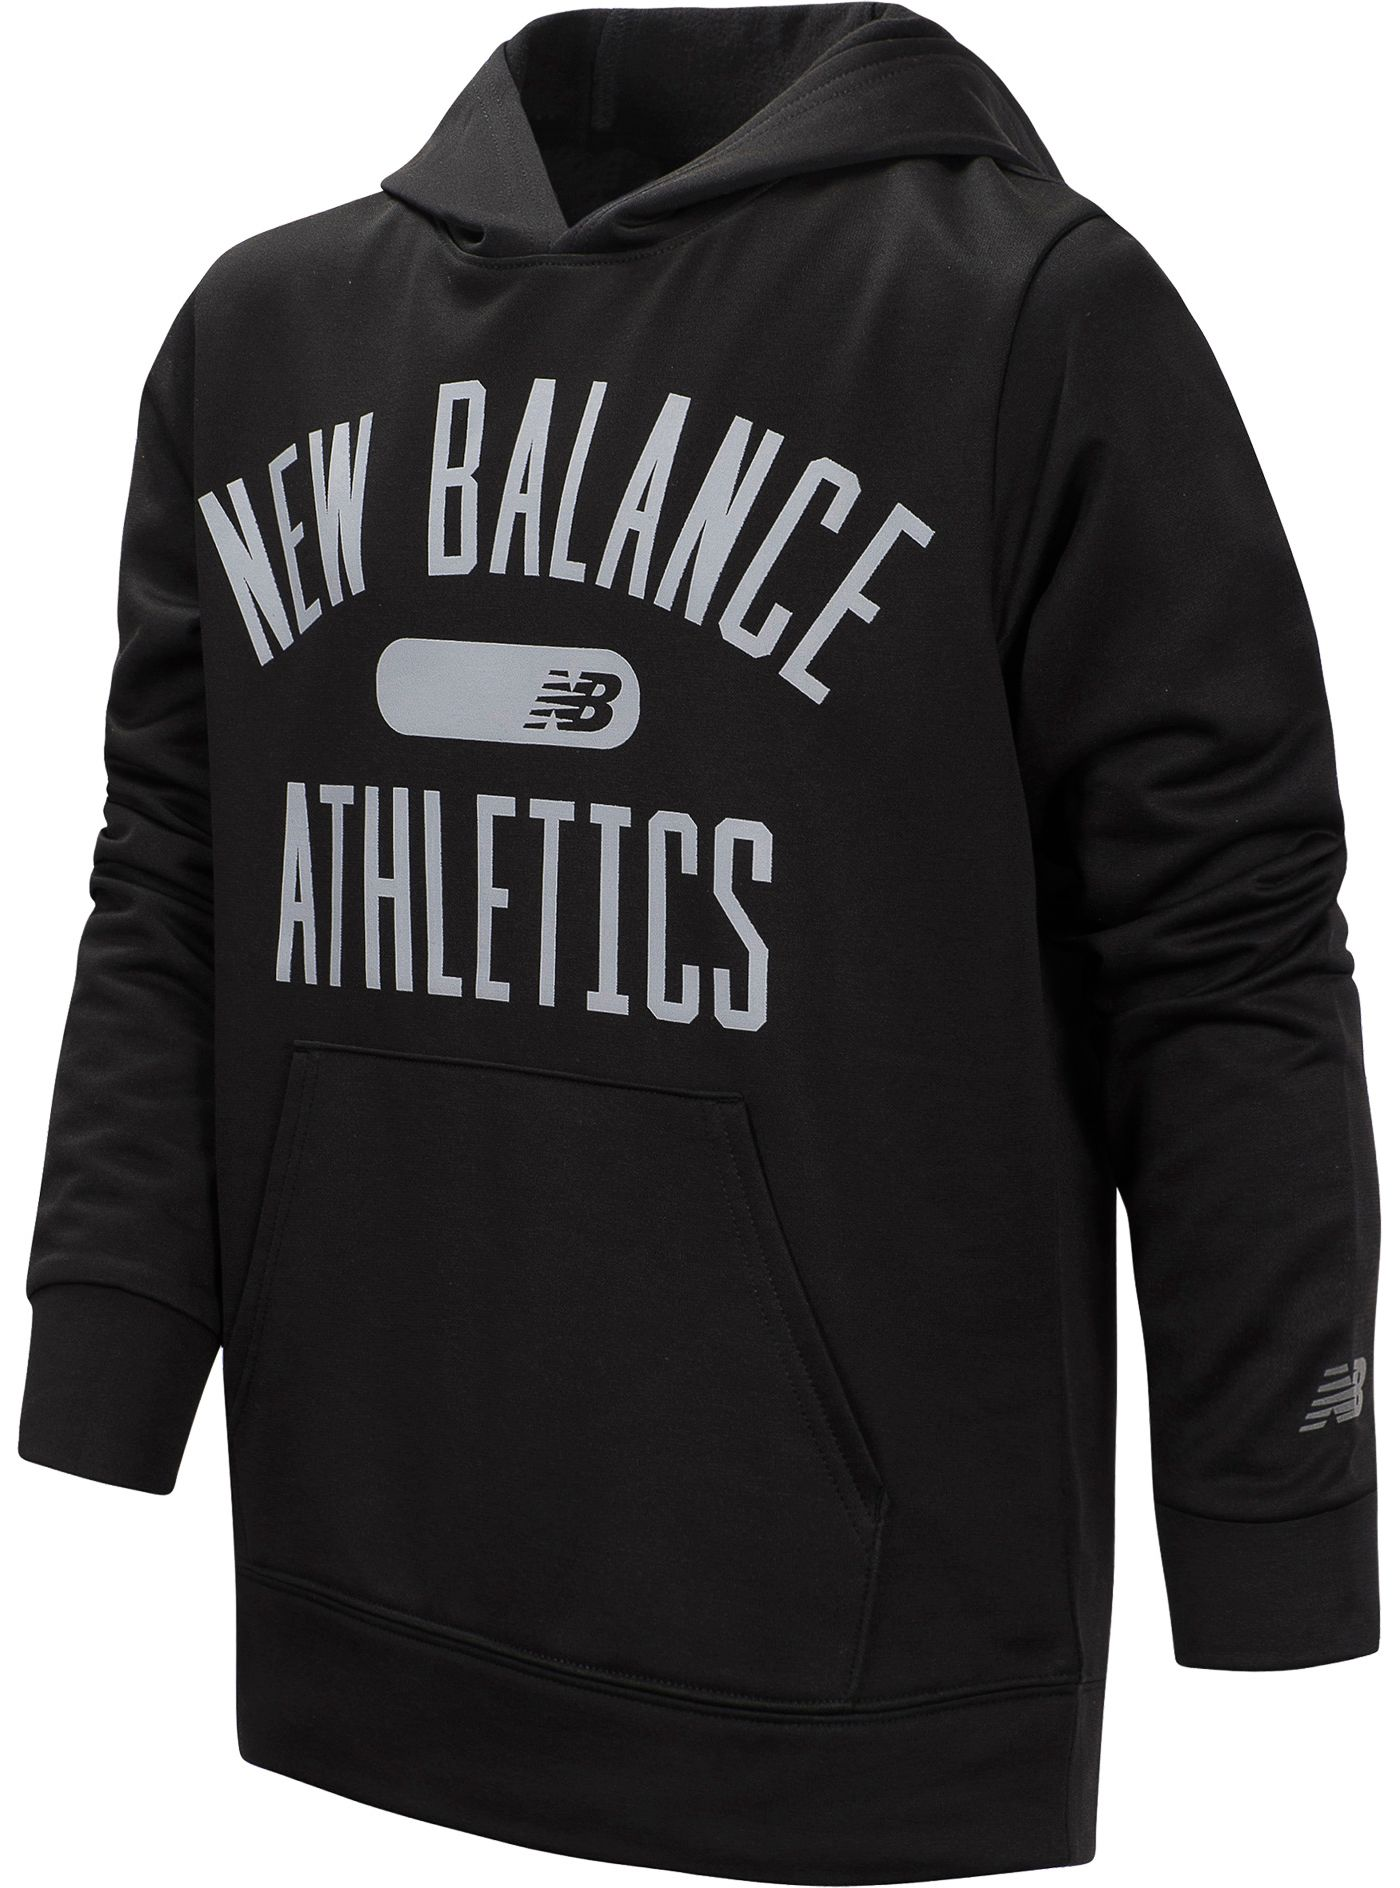 New Balance Little Boys' Wordmark Graphic Hoodie